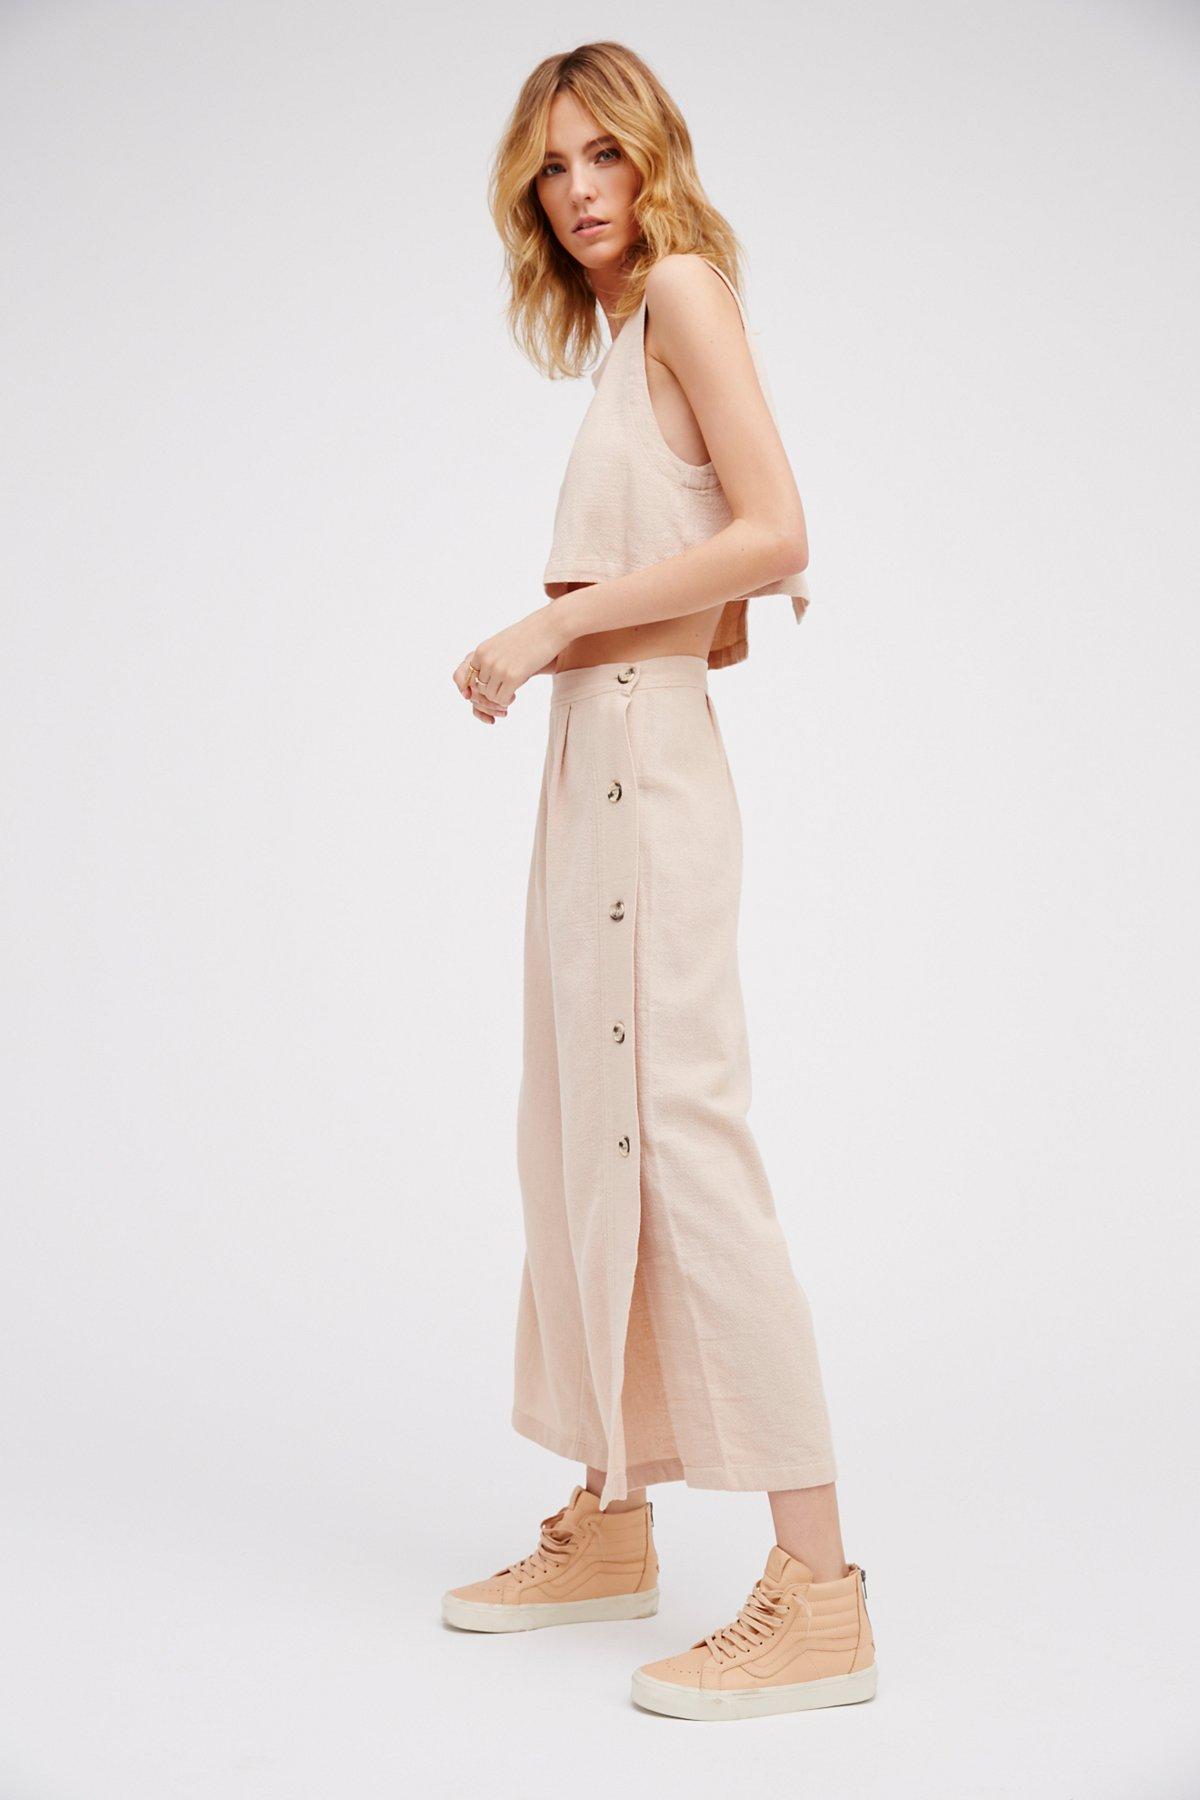 The Annika长裤套装